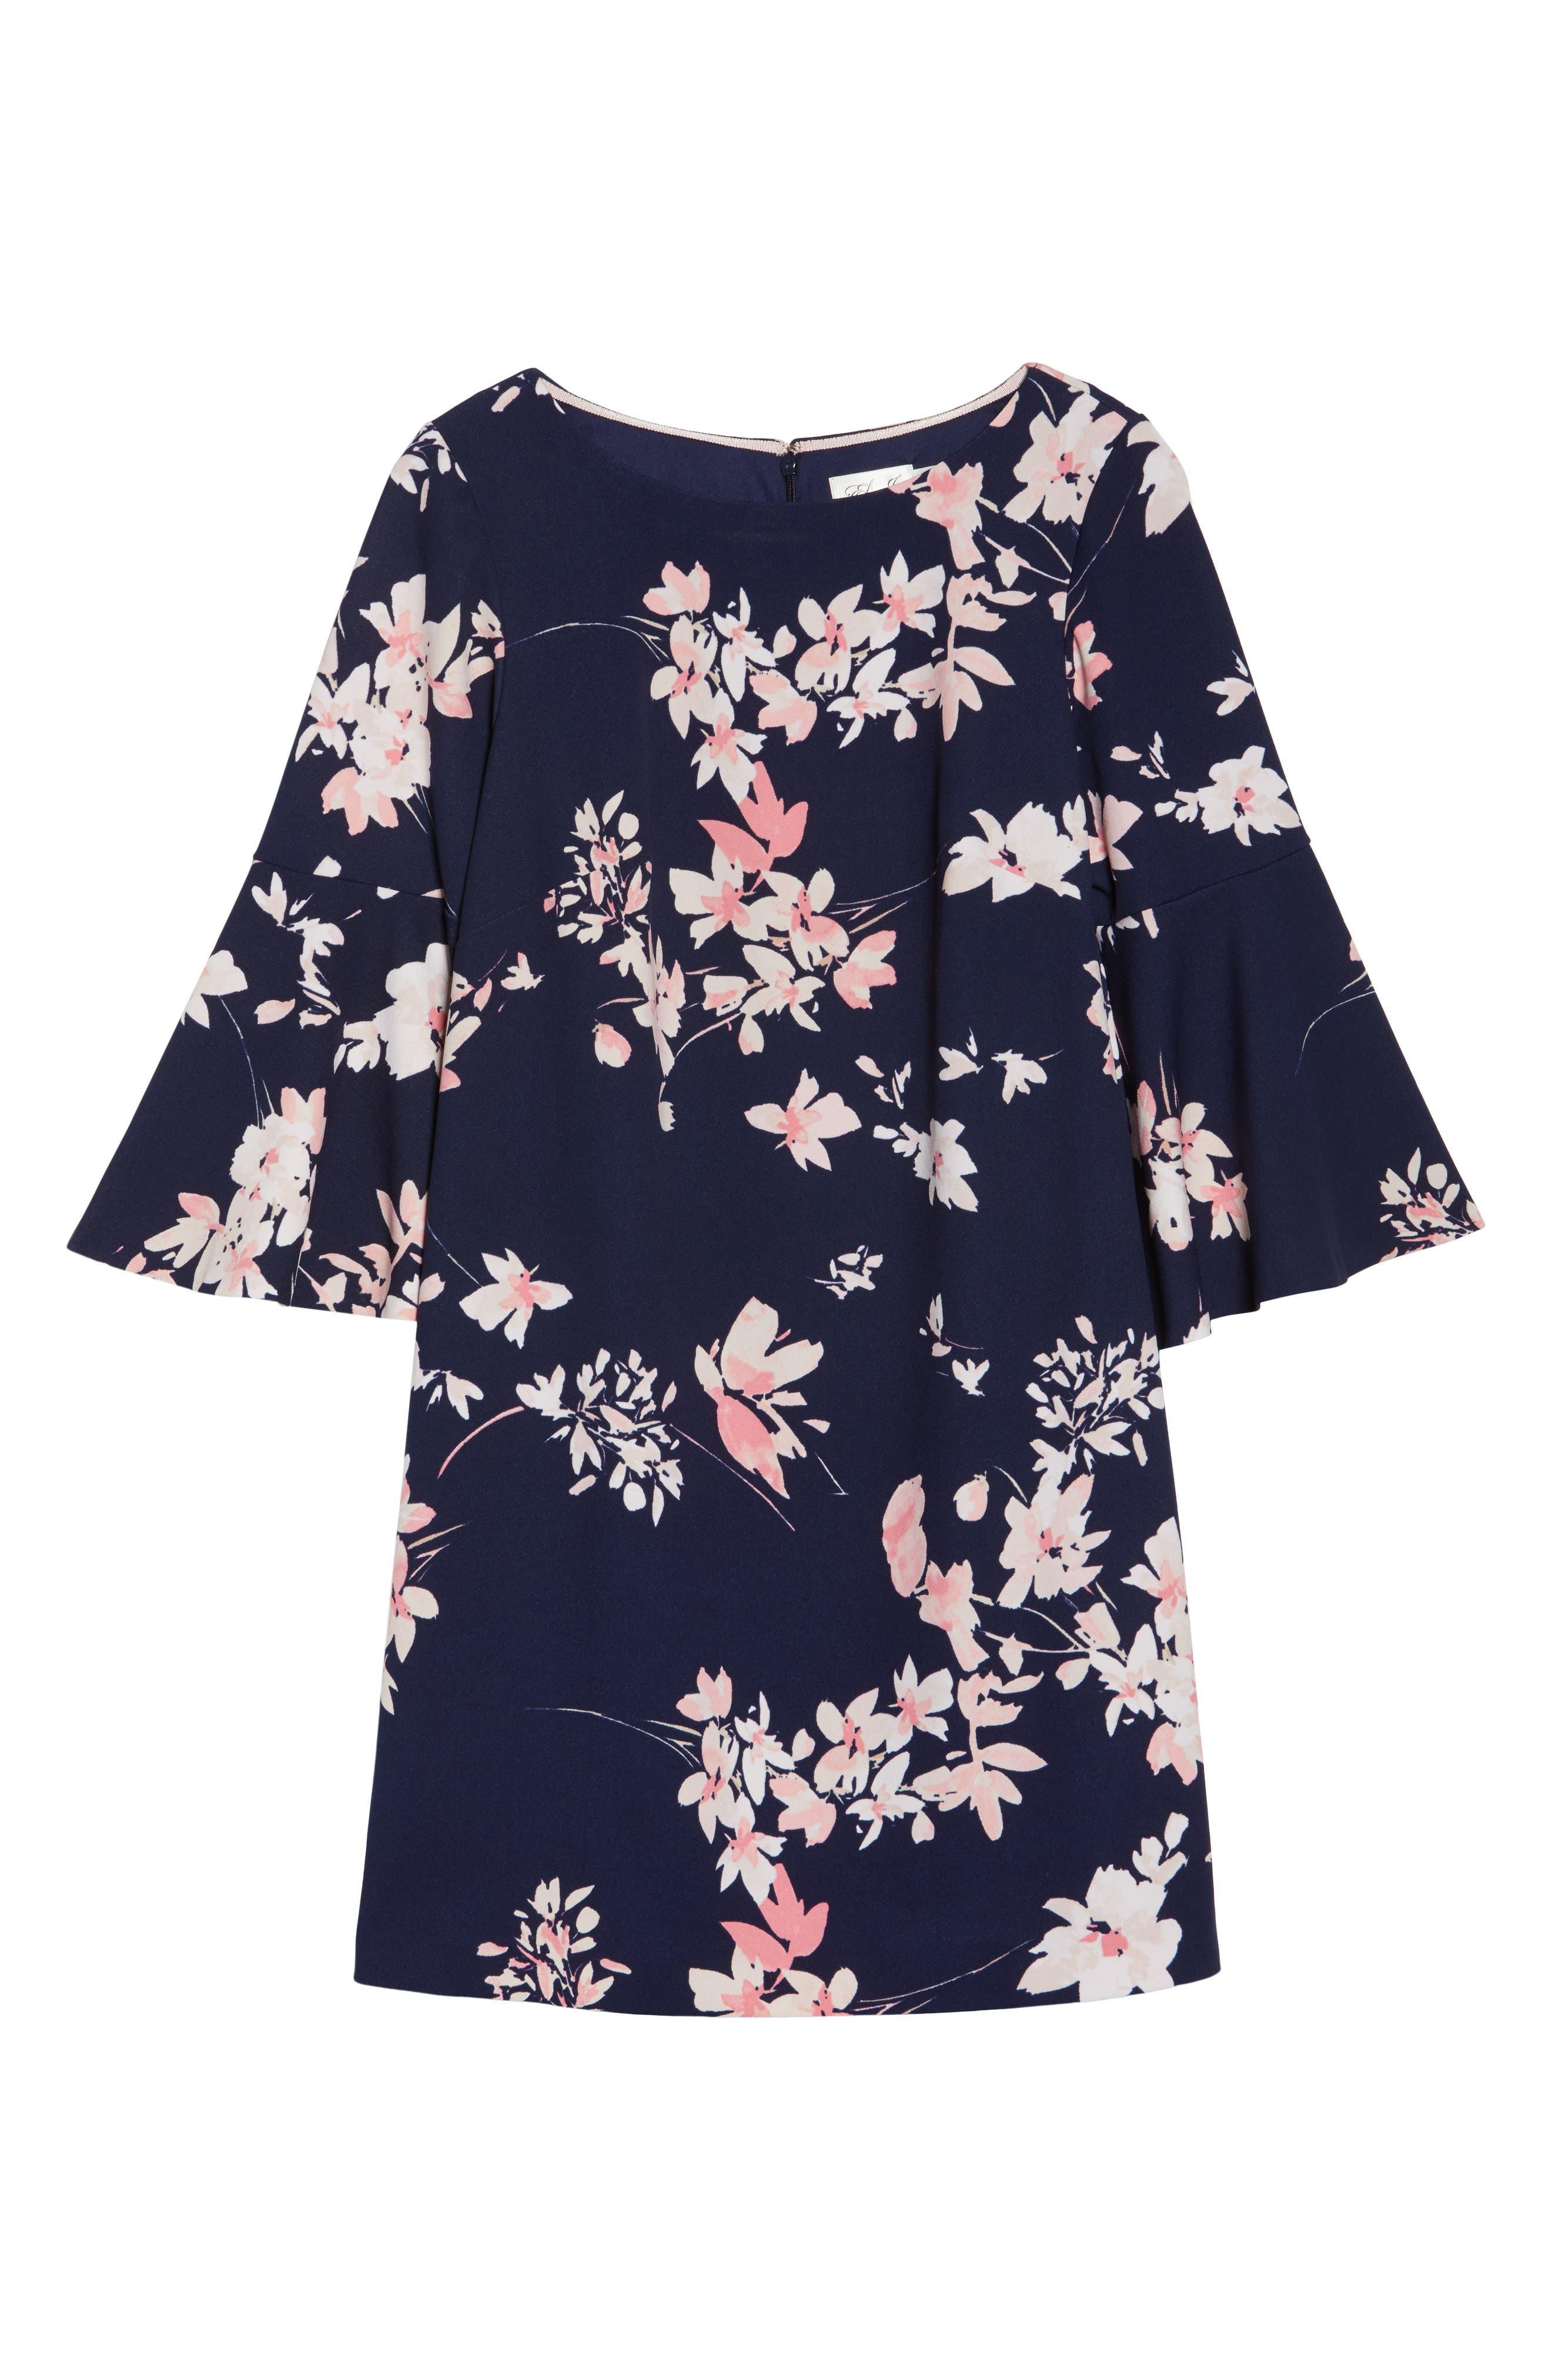 ELIZA J, Floral Print Bell Sleeve Shift Dress, Alternate thumbnail 6, color, NAVY/ PINK